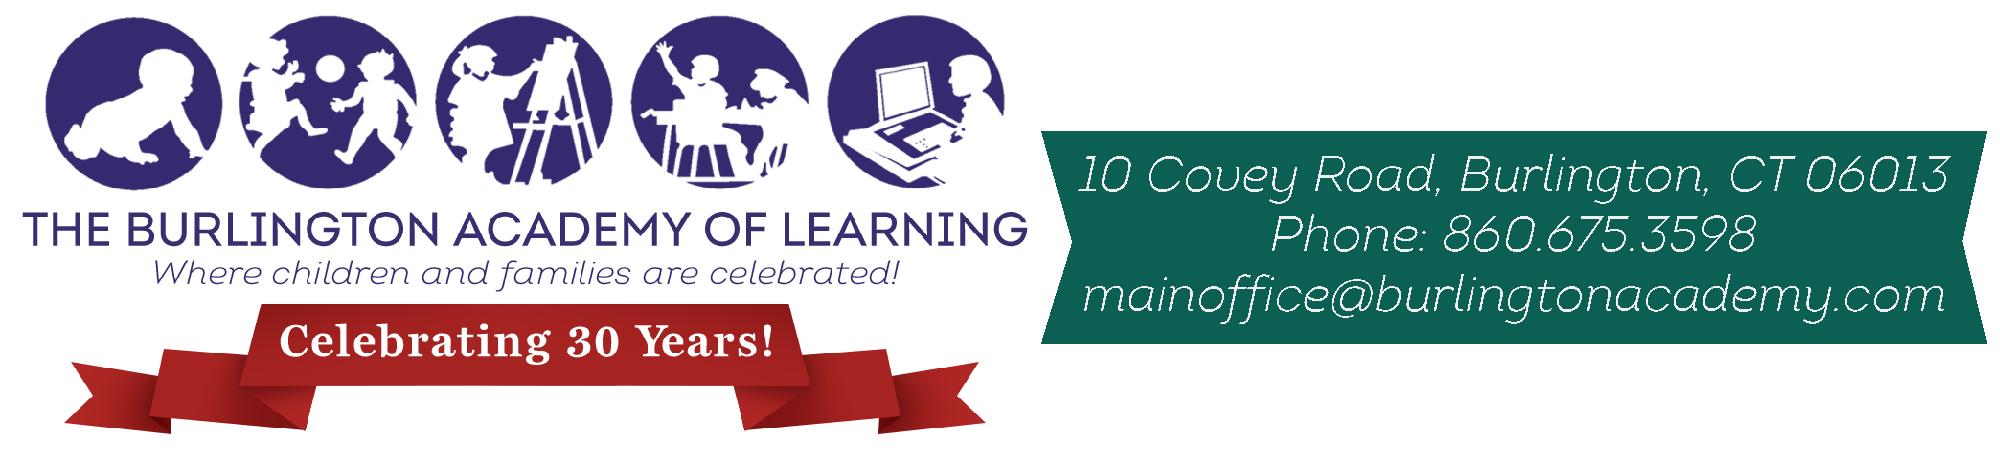 Burlington Academy of Learning Logo